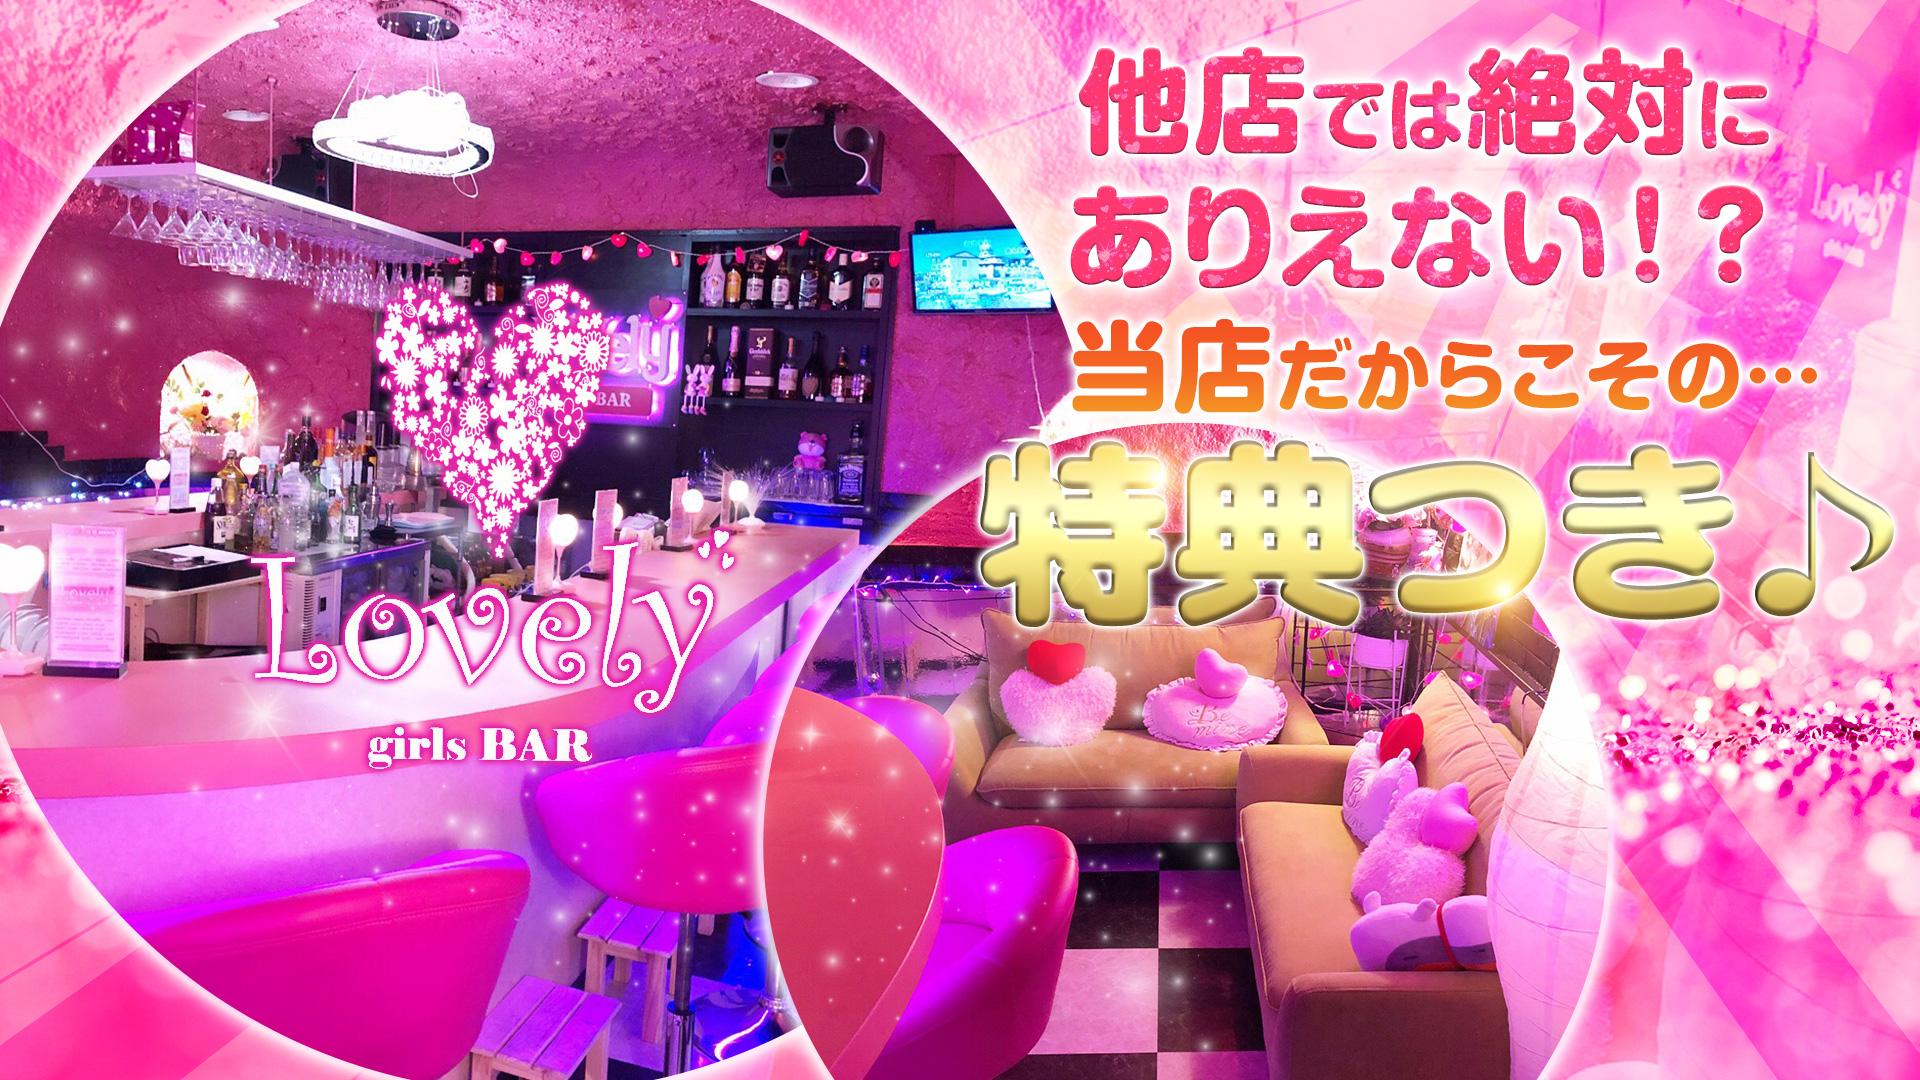 BAR Lovely<ラブリー> 川崎 ガールズバー TOP画像